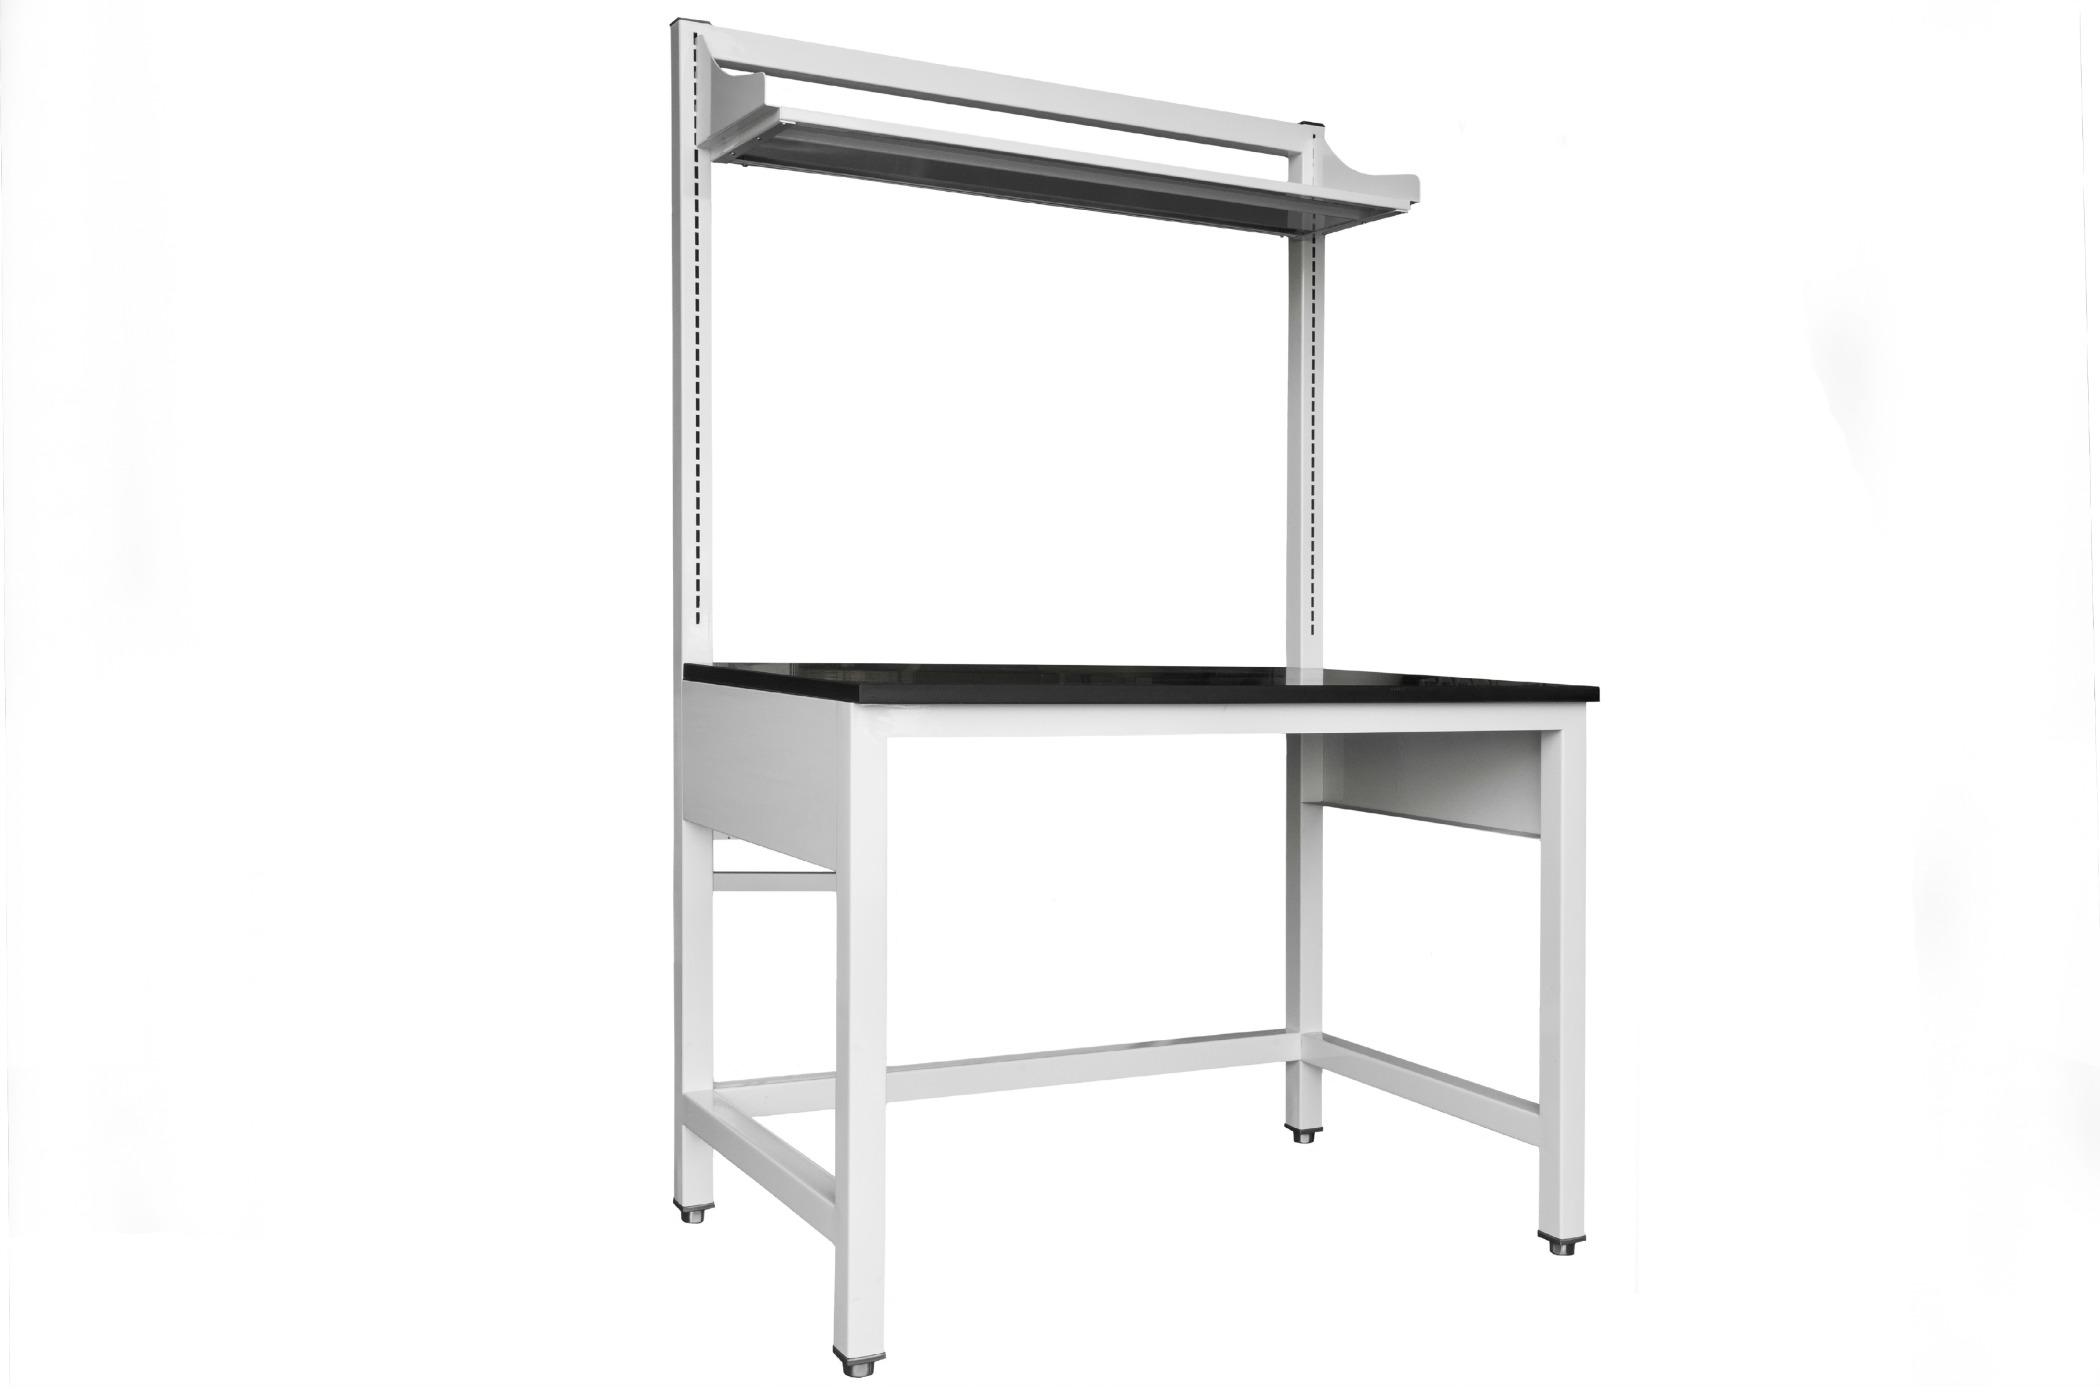 TablesWorkstations6.jpg